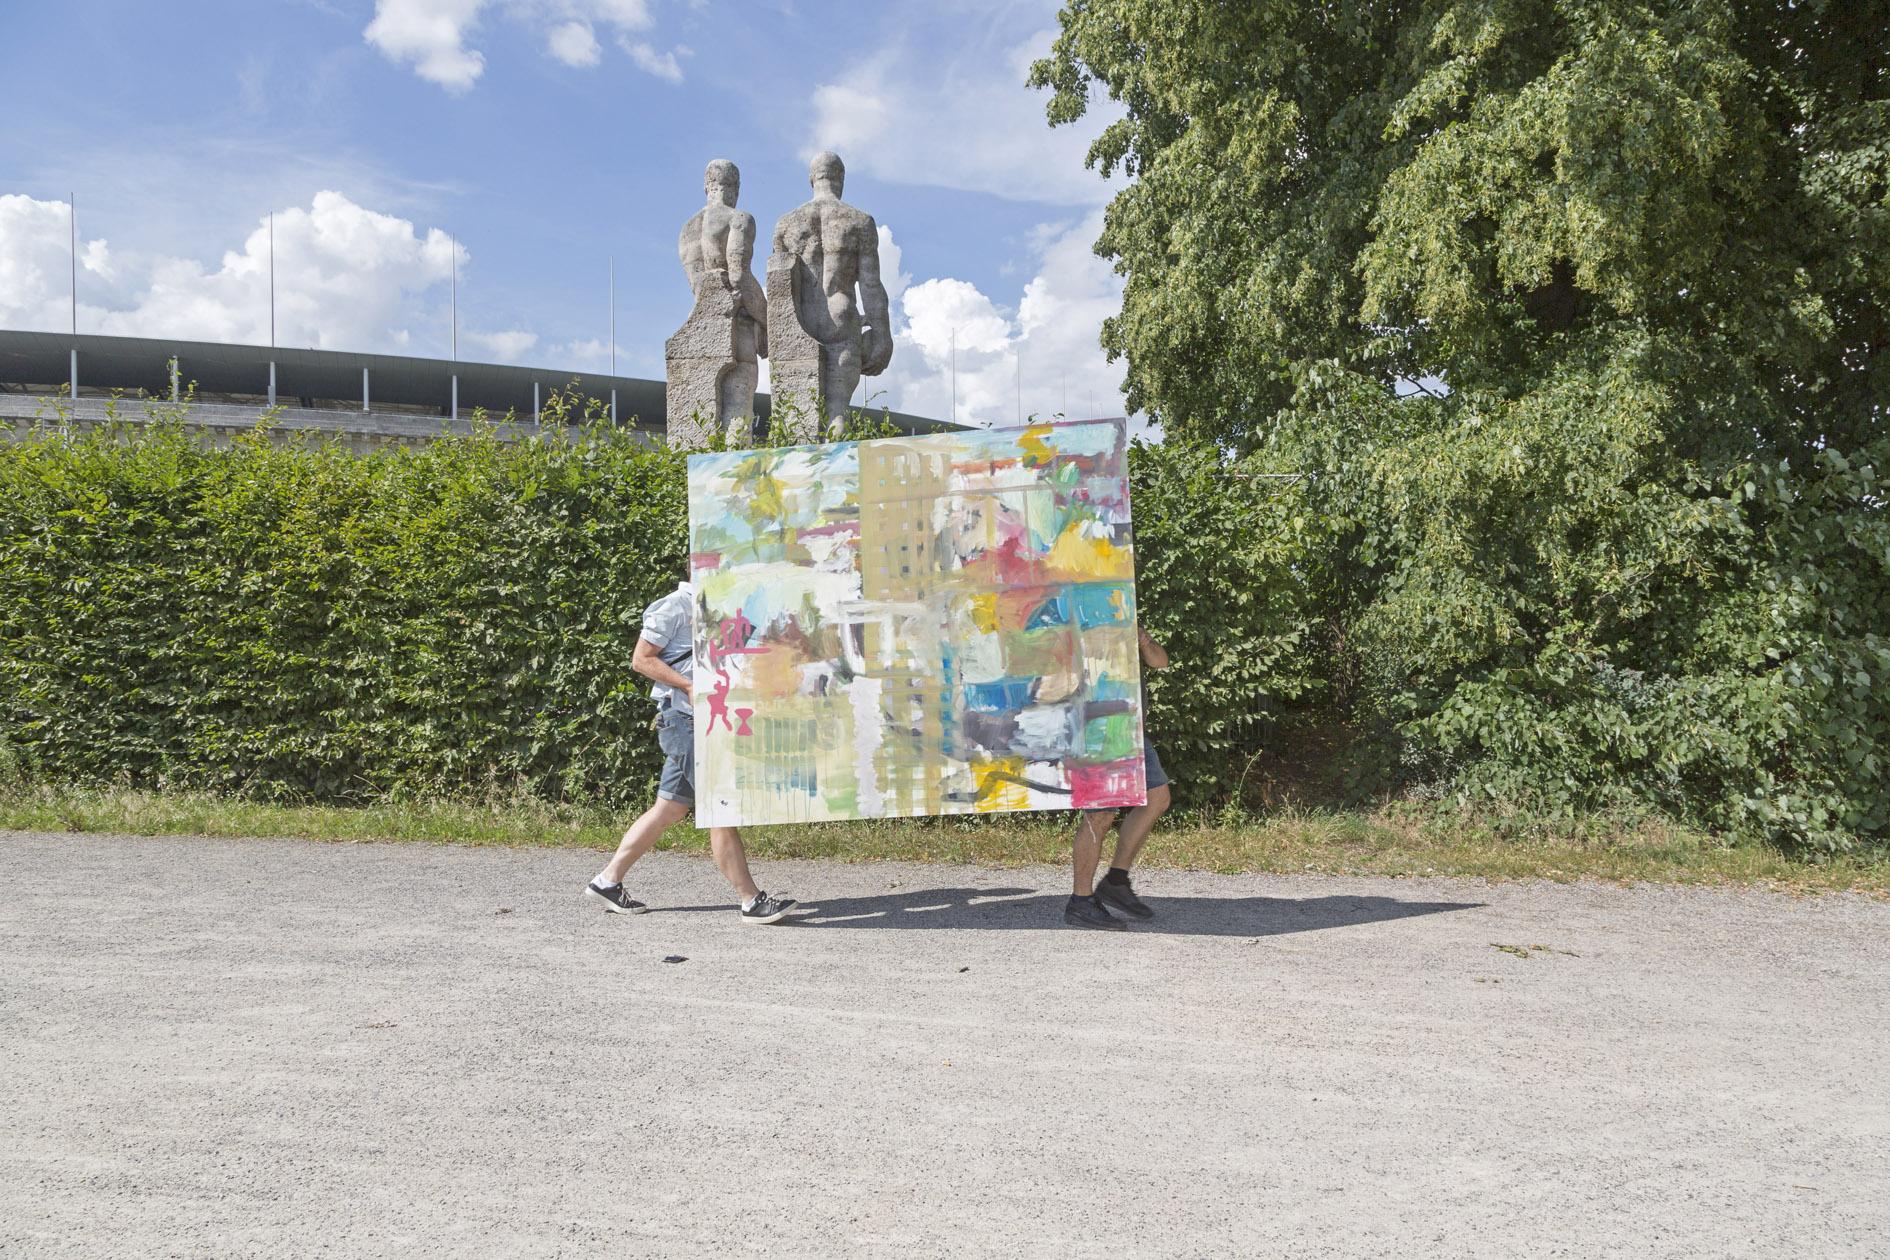 5. Walk am Di. 27. Juli, 10-13 Uhr Uhr: Kolbe Museum - Corbusierhaus - Olympiastadion